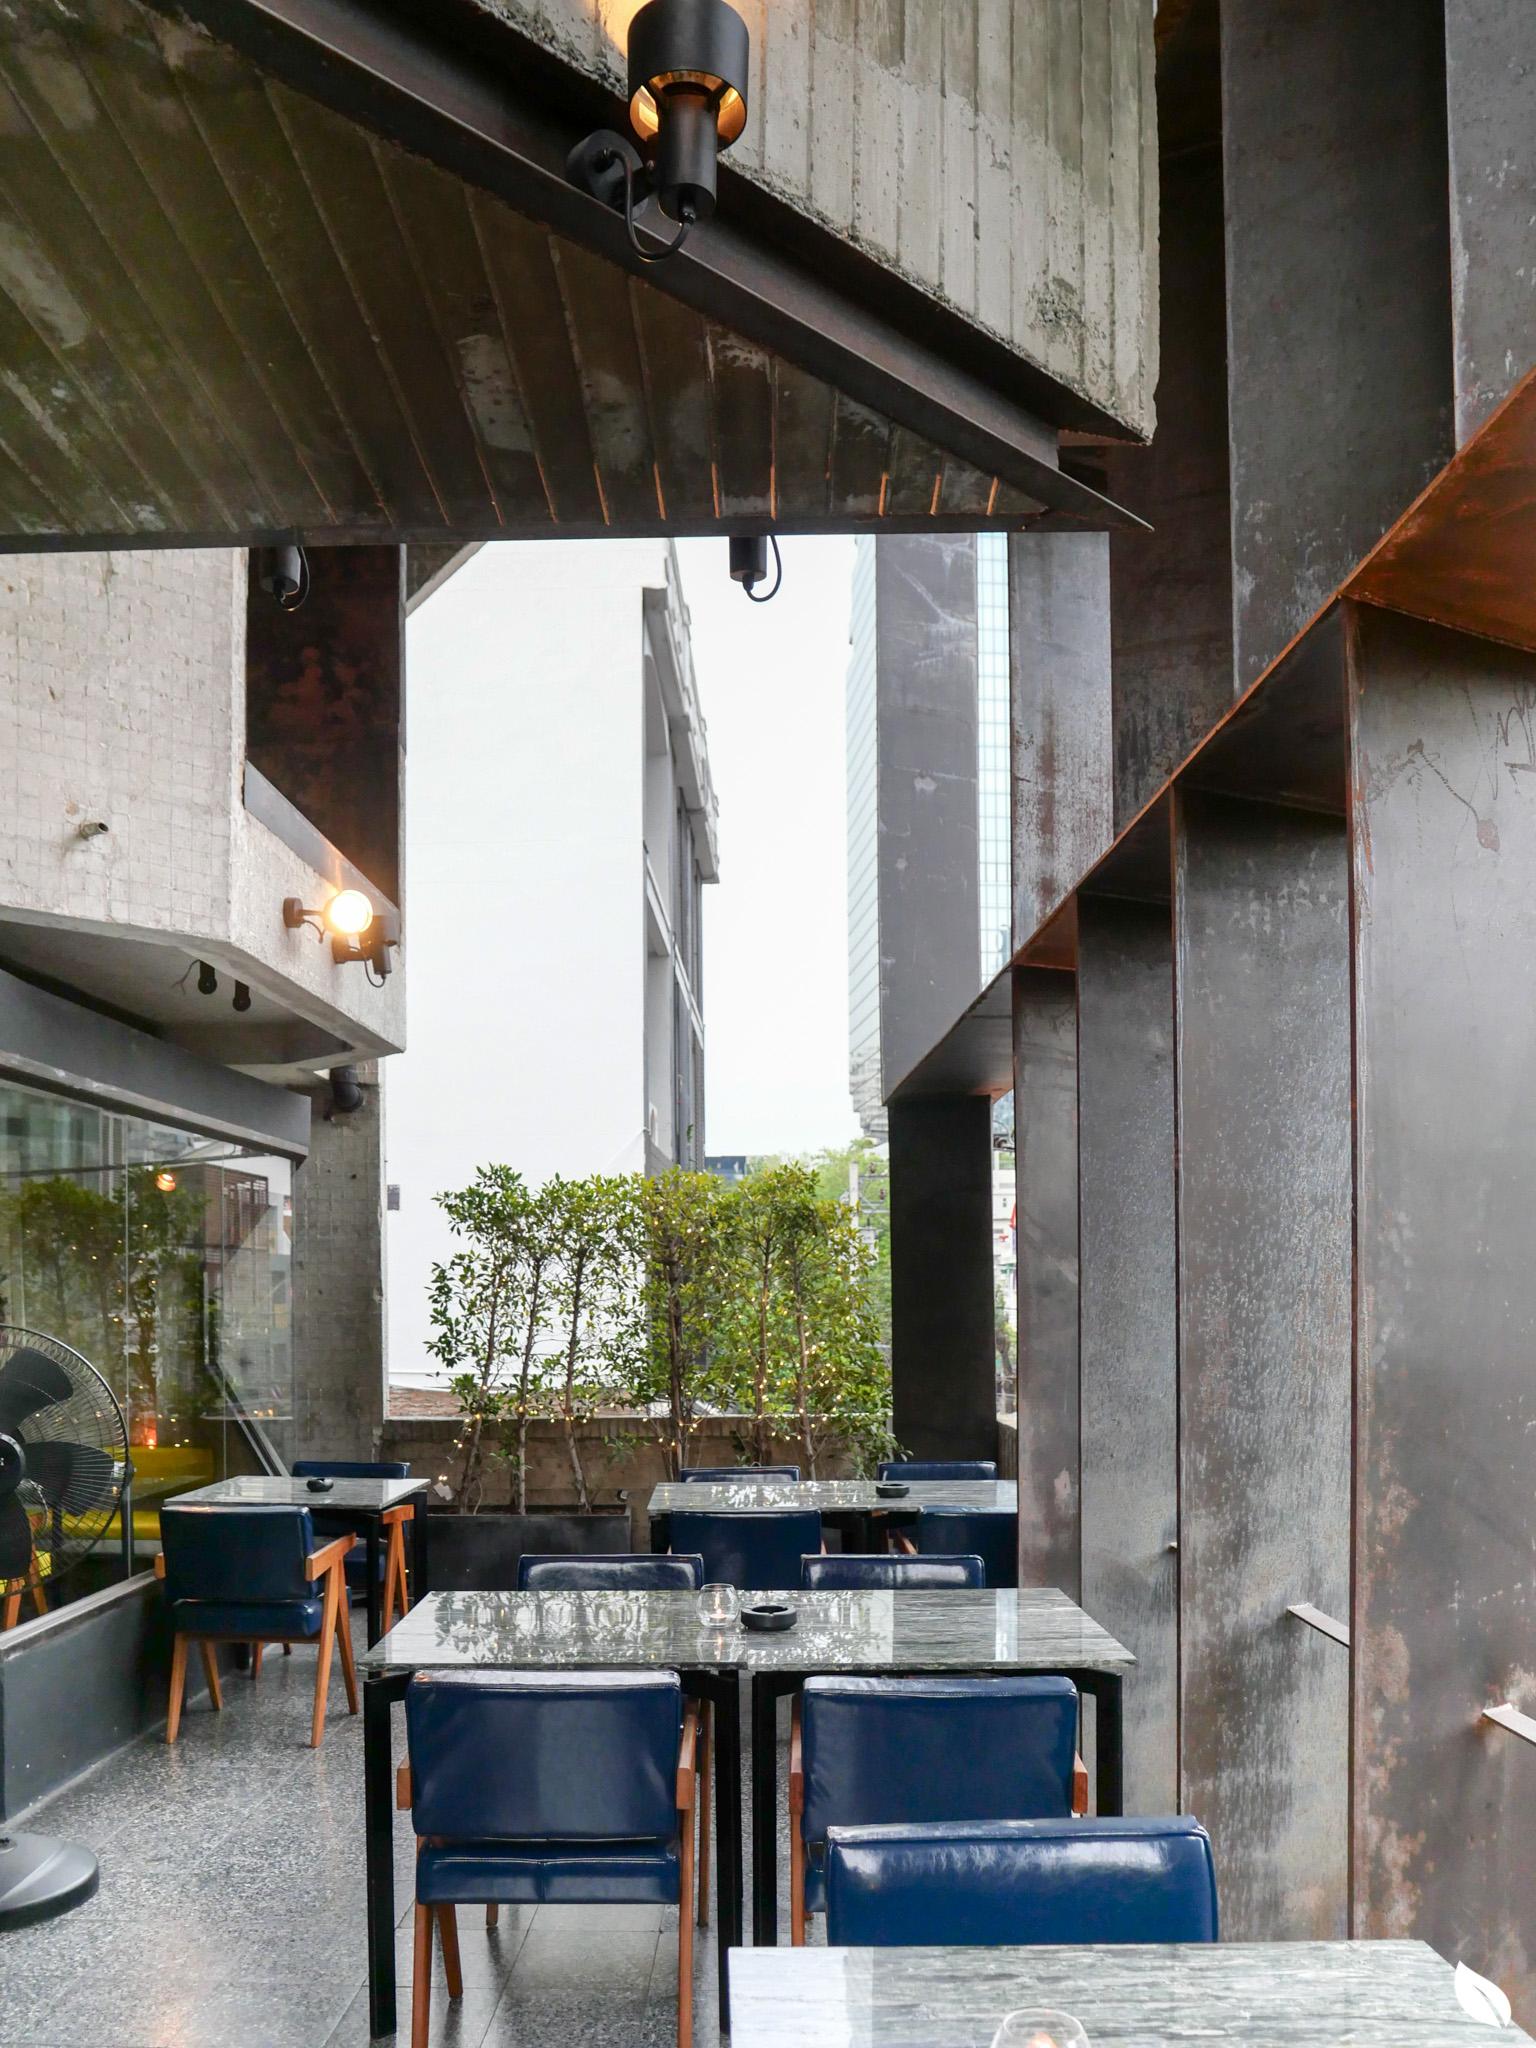 ANIL Sathorn 12 คอนโดสาทรสุดหรูที่ยกระดับคุณภาพชีวิตของผู้พักอาศัย ด้วยมาตรฐาน WELL Building Standard 65 - GRAND UNITY